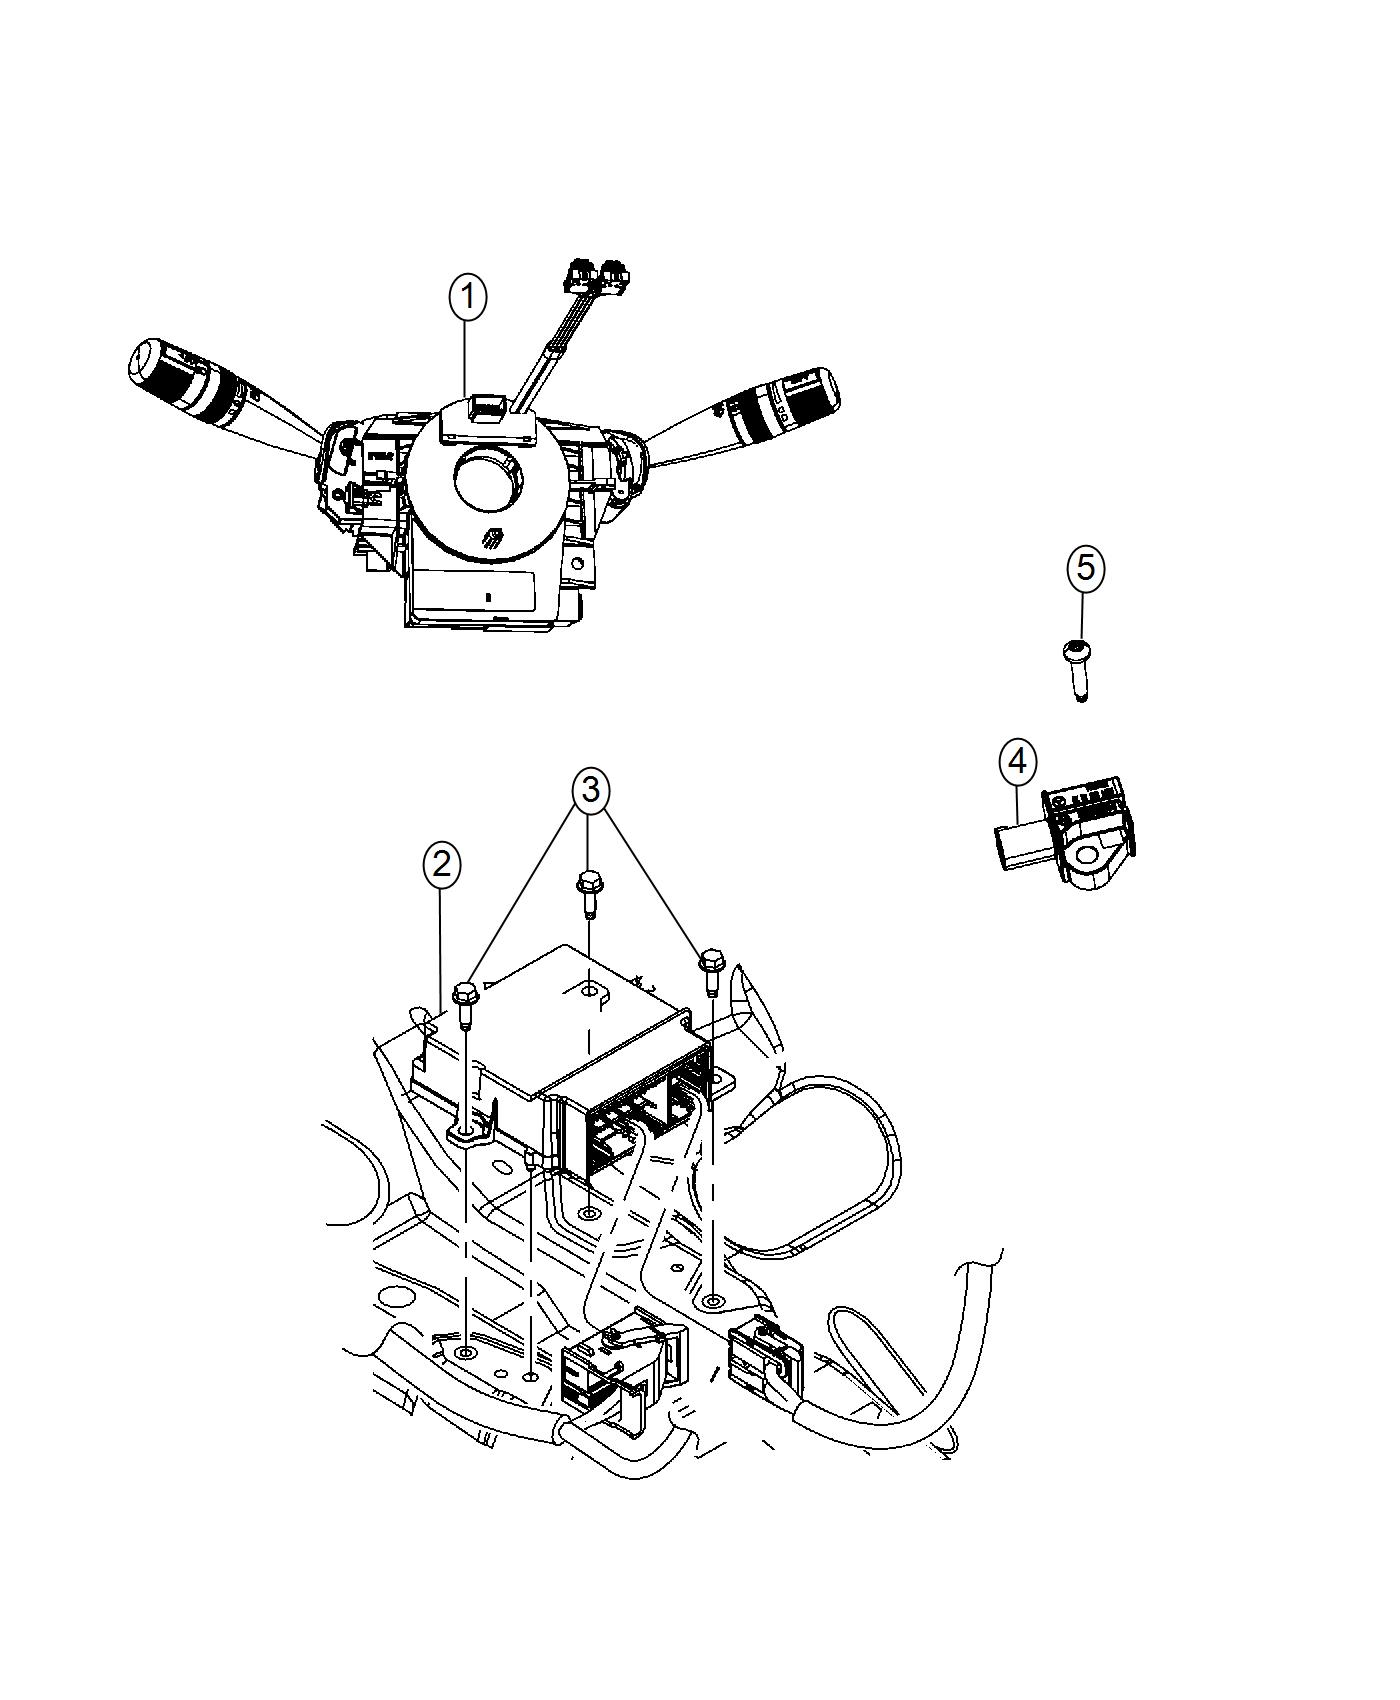 2013 Dodge Journey Clockspring. Steering column control